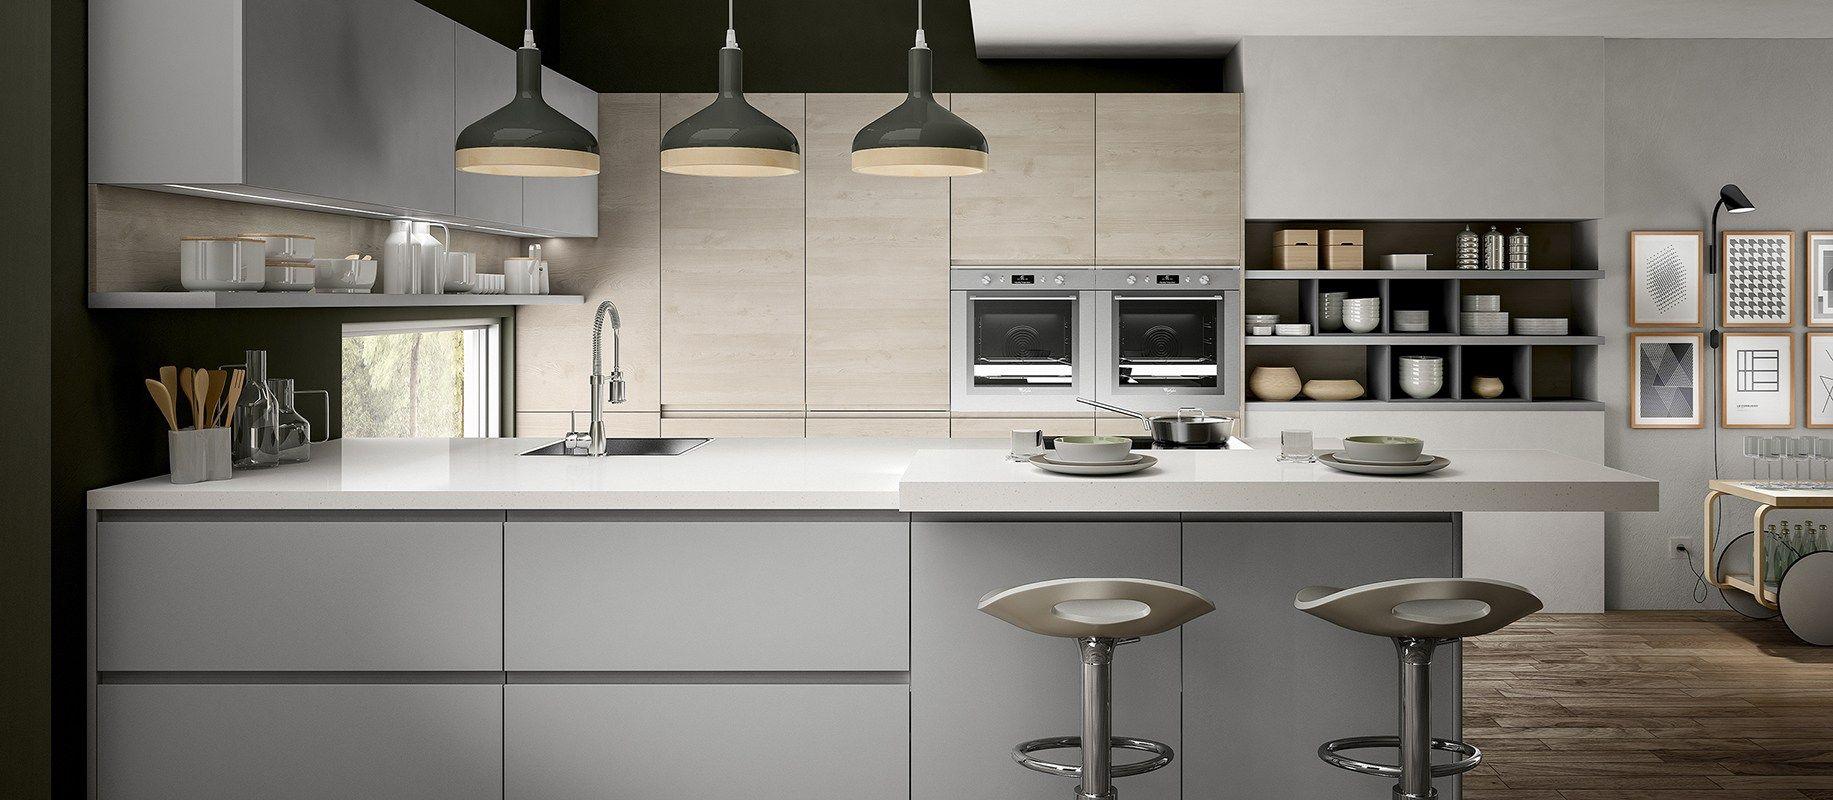 Cucina componibile con maniglie integrate wega by arredo 3 for Cucina wega arredo 3